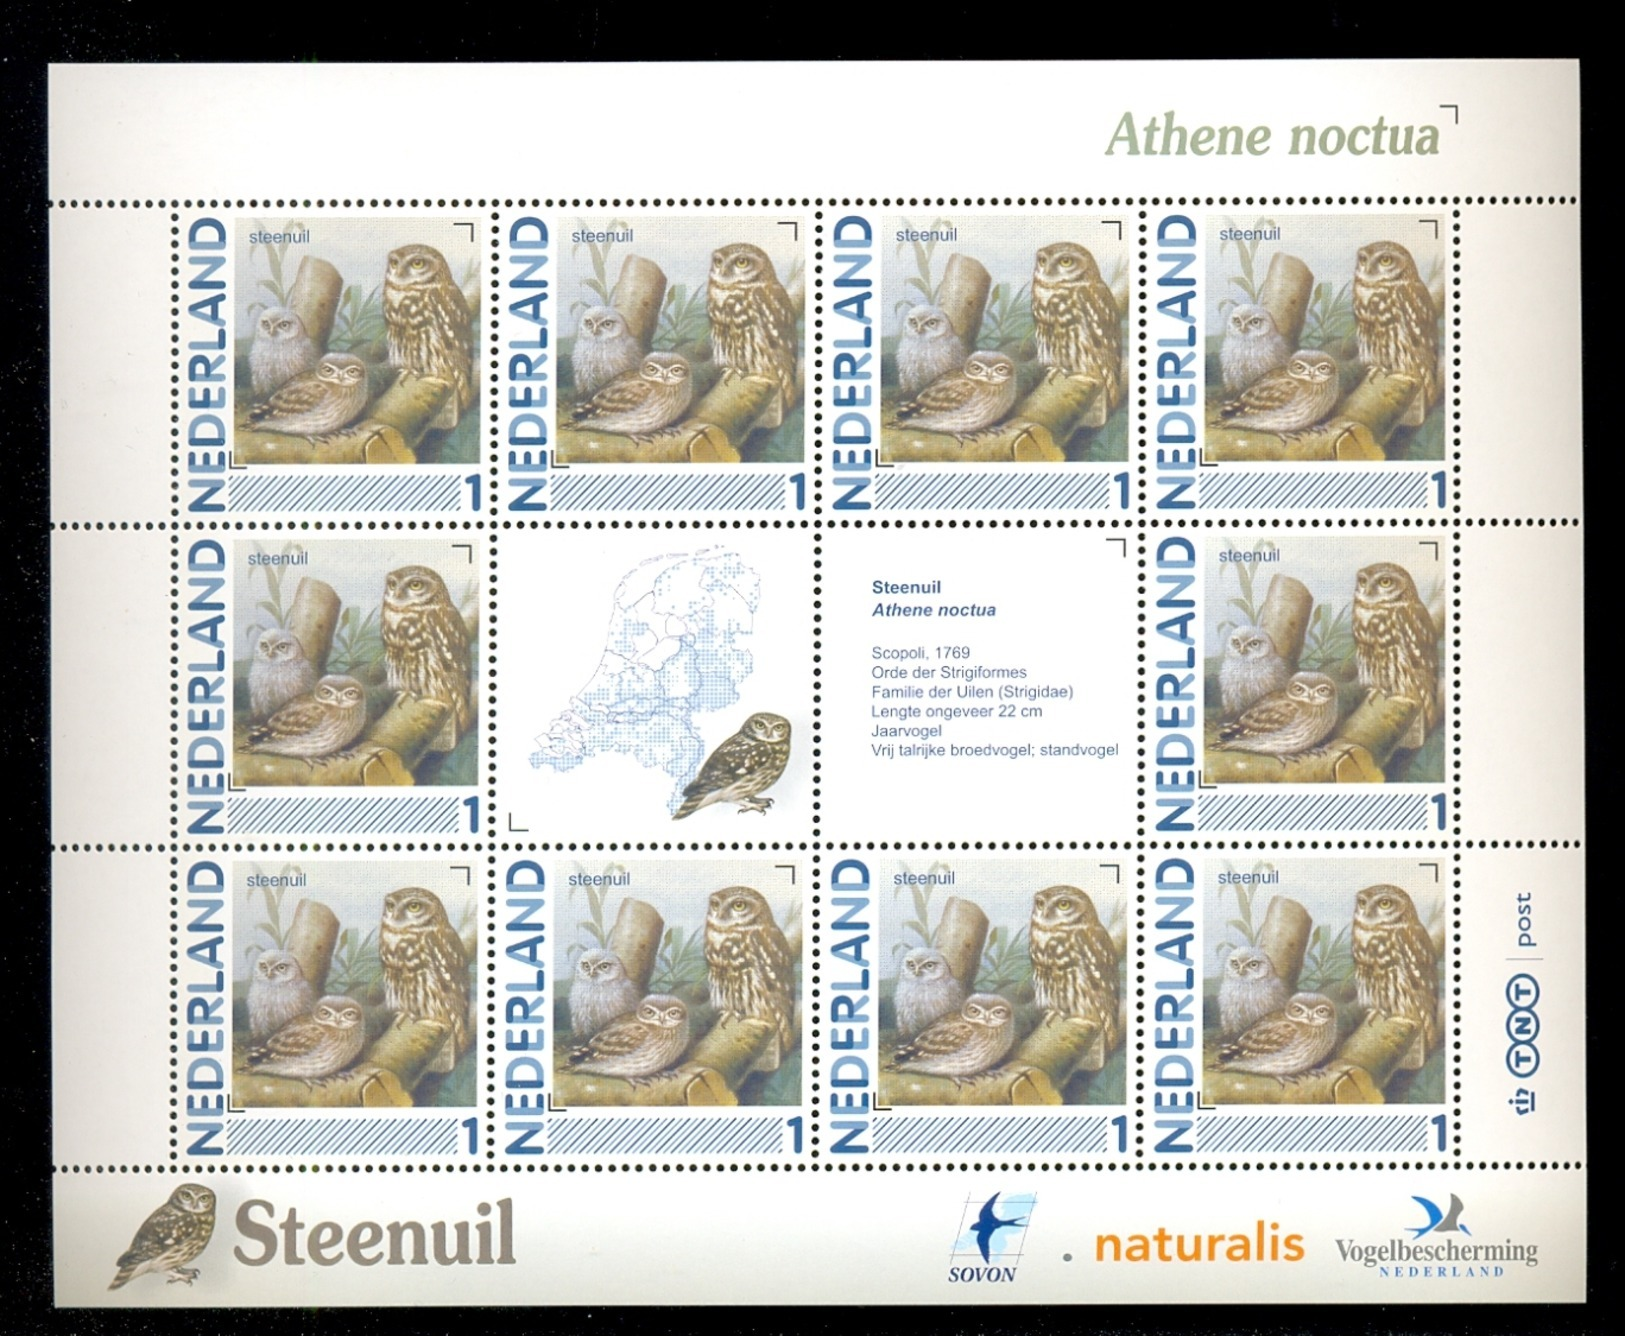 NETHERLANDS COMPLETE SHEET 10v 2011 / 2014 BIRD BIRDS OISEAUX STEENUIL LITTLE OWL HIBOU * MNH - 1980-... (Beatrix)